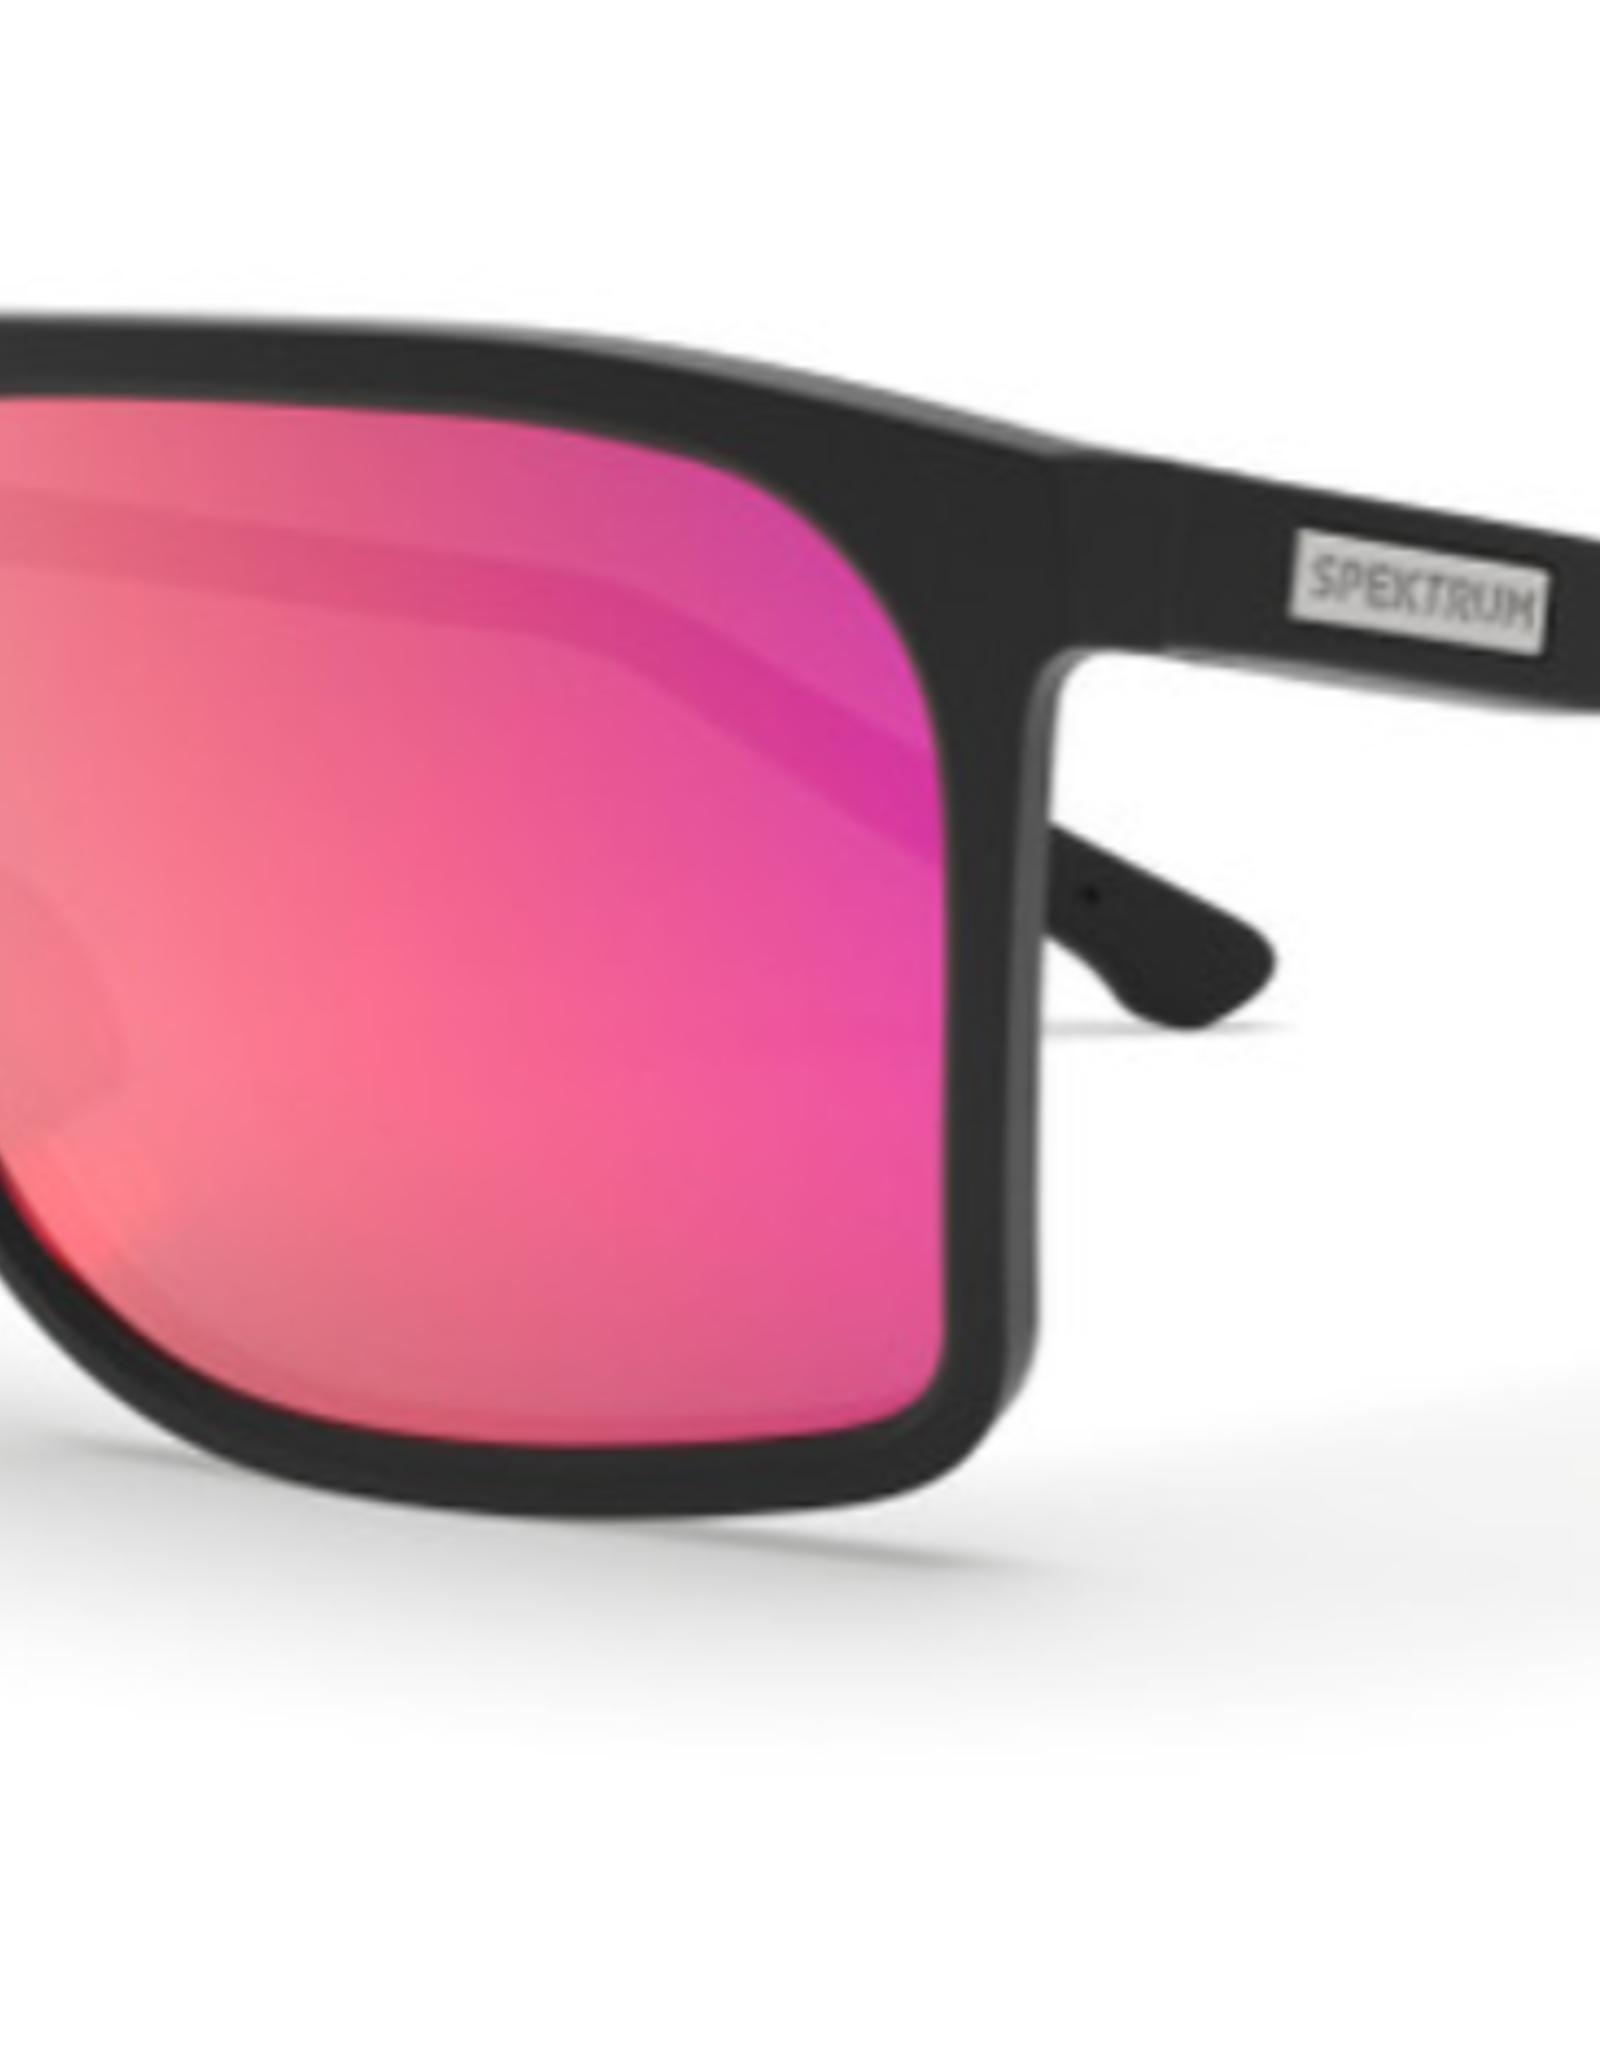 spektrum Kall eyewear